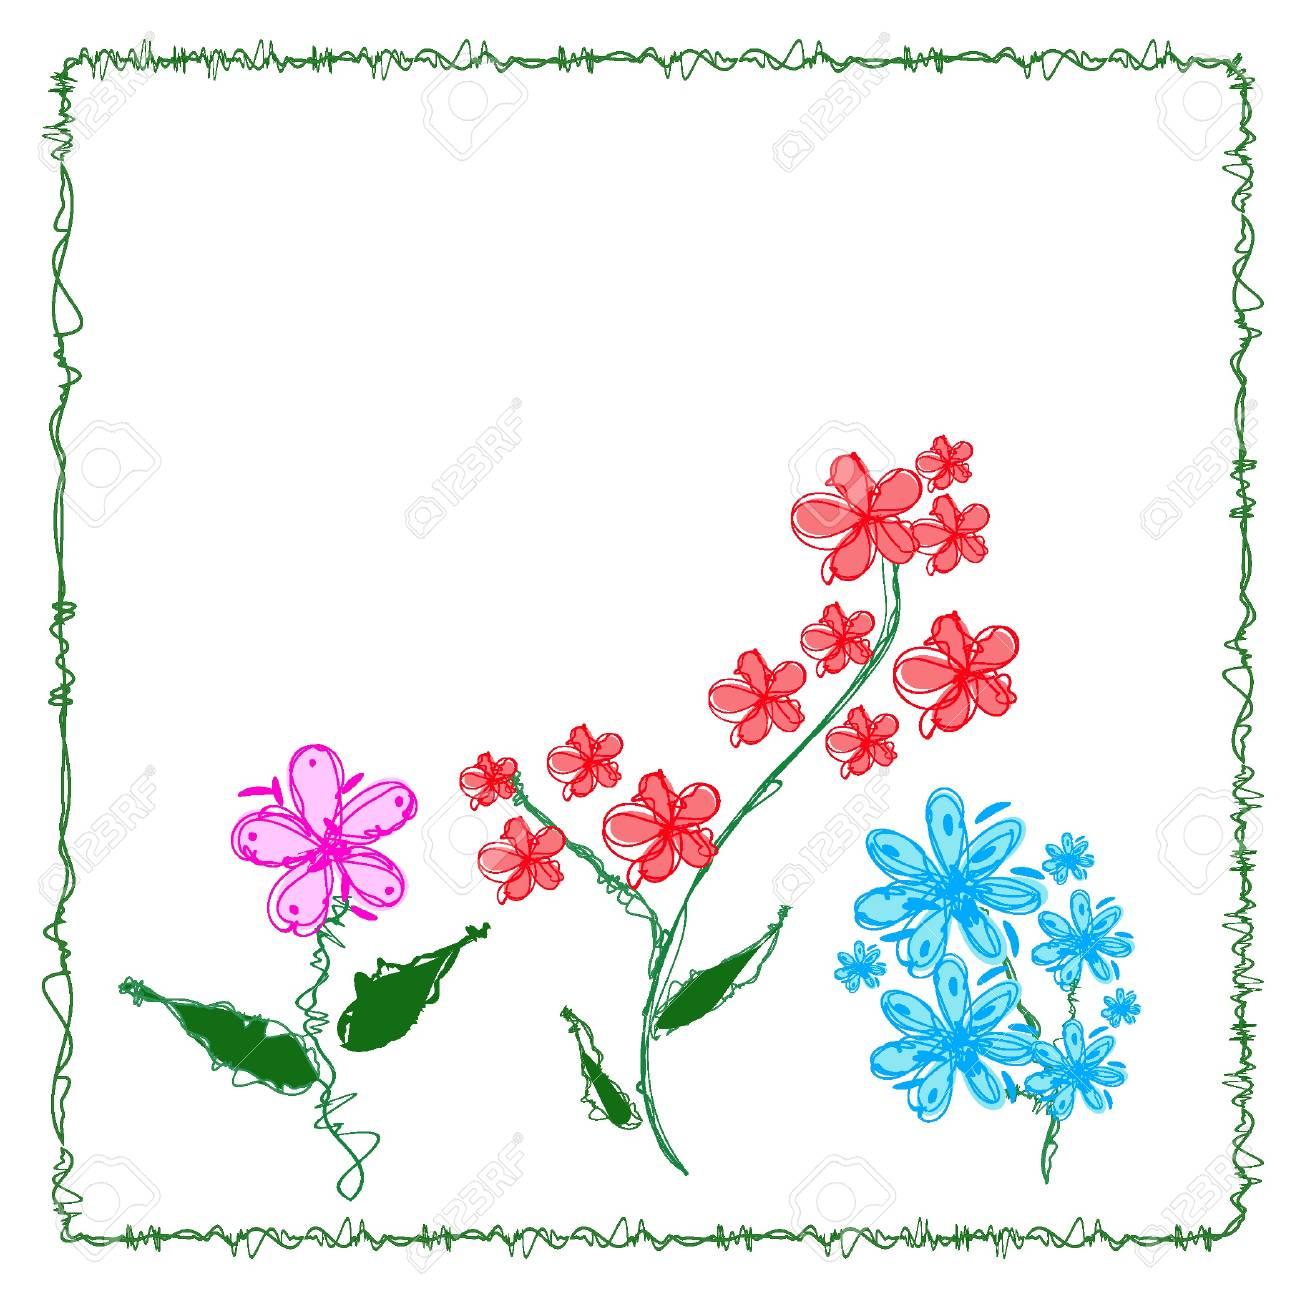 Swirly vector flowers. Eps8 Stock Vector - 11053159